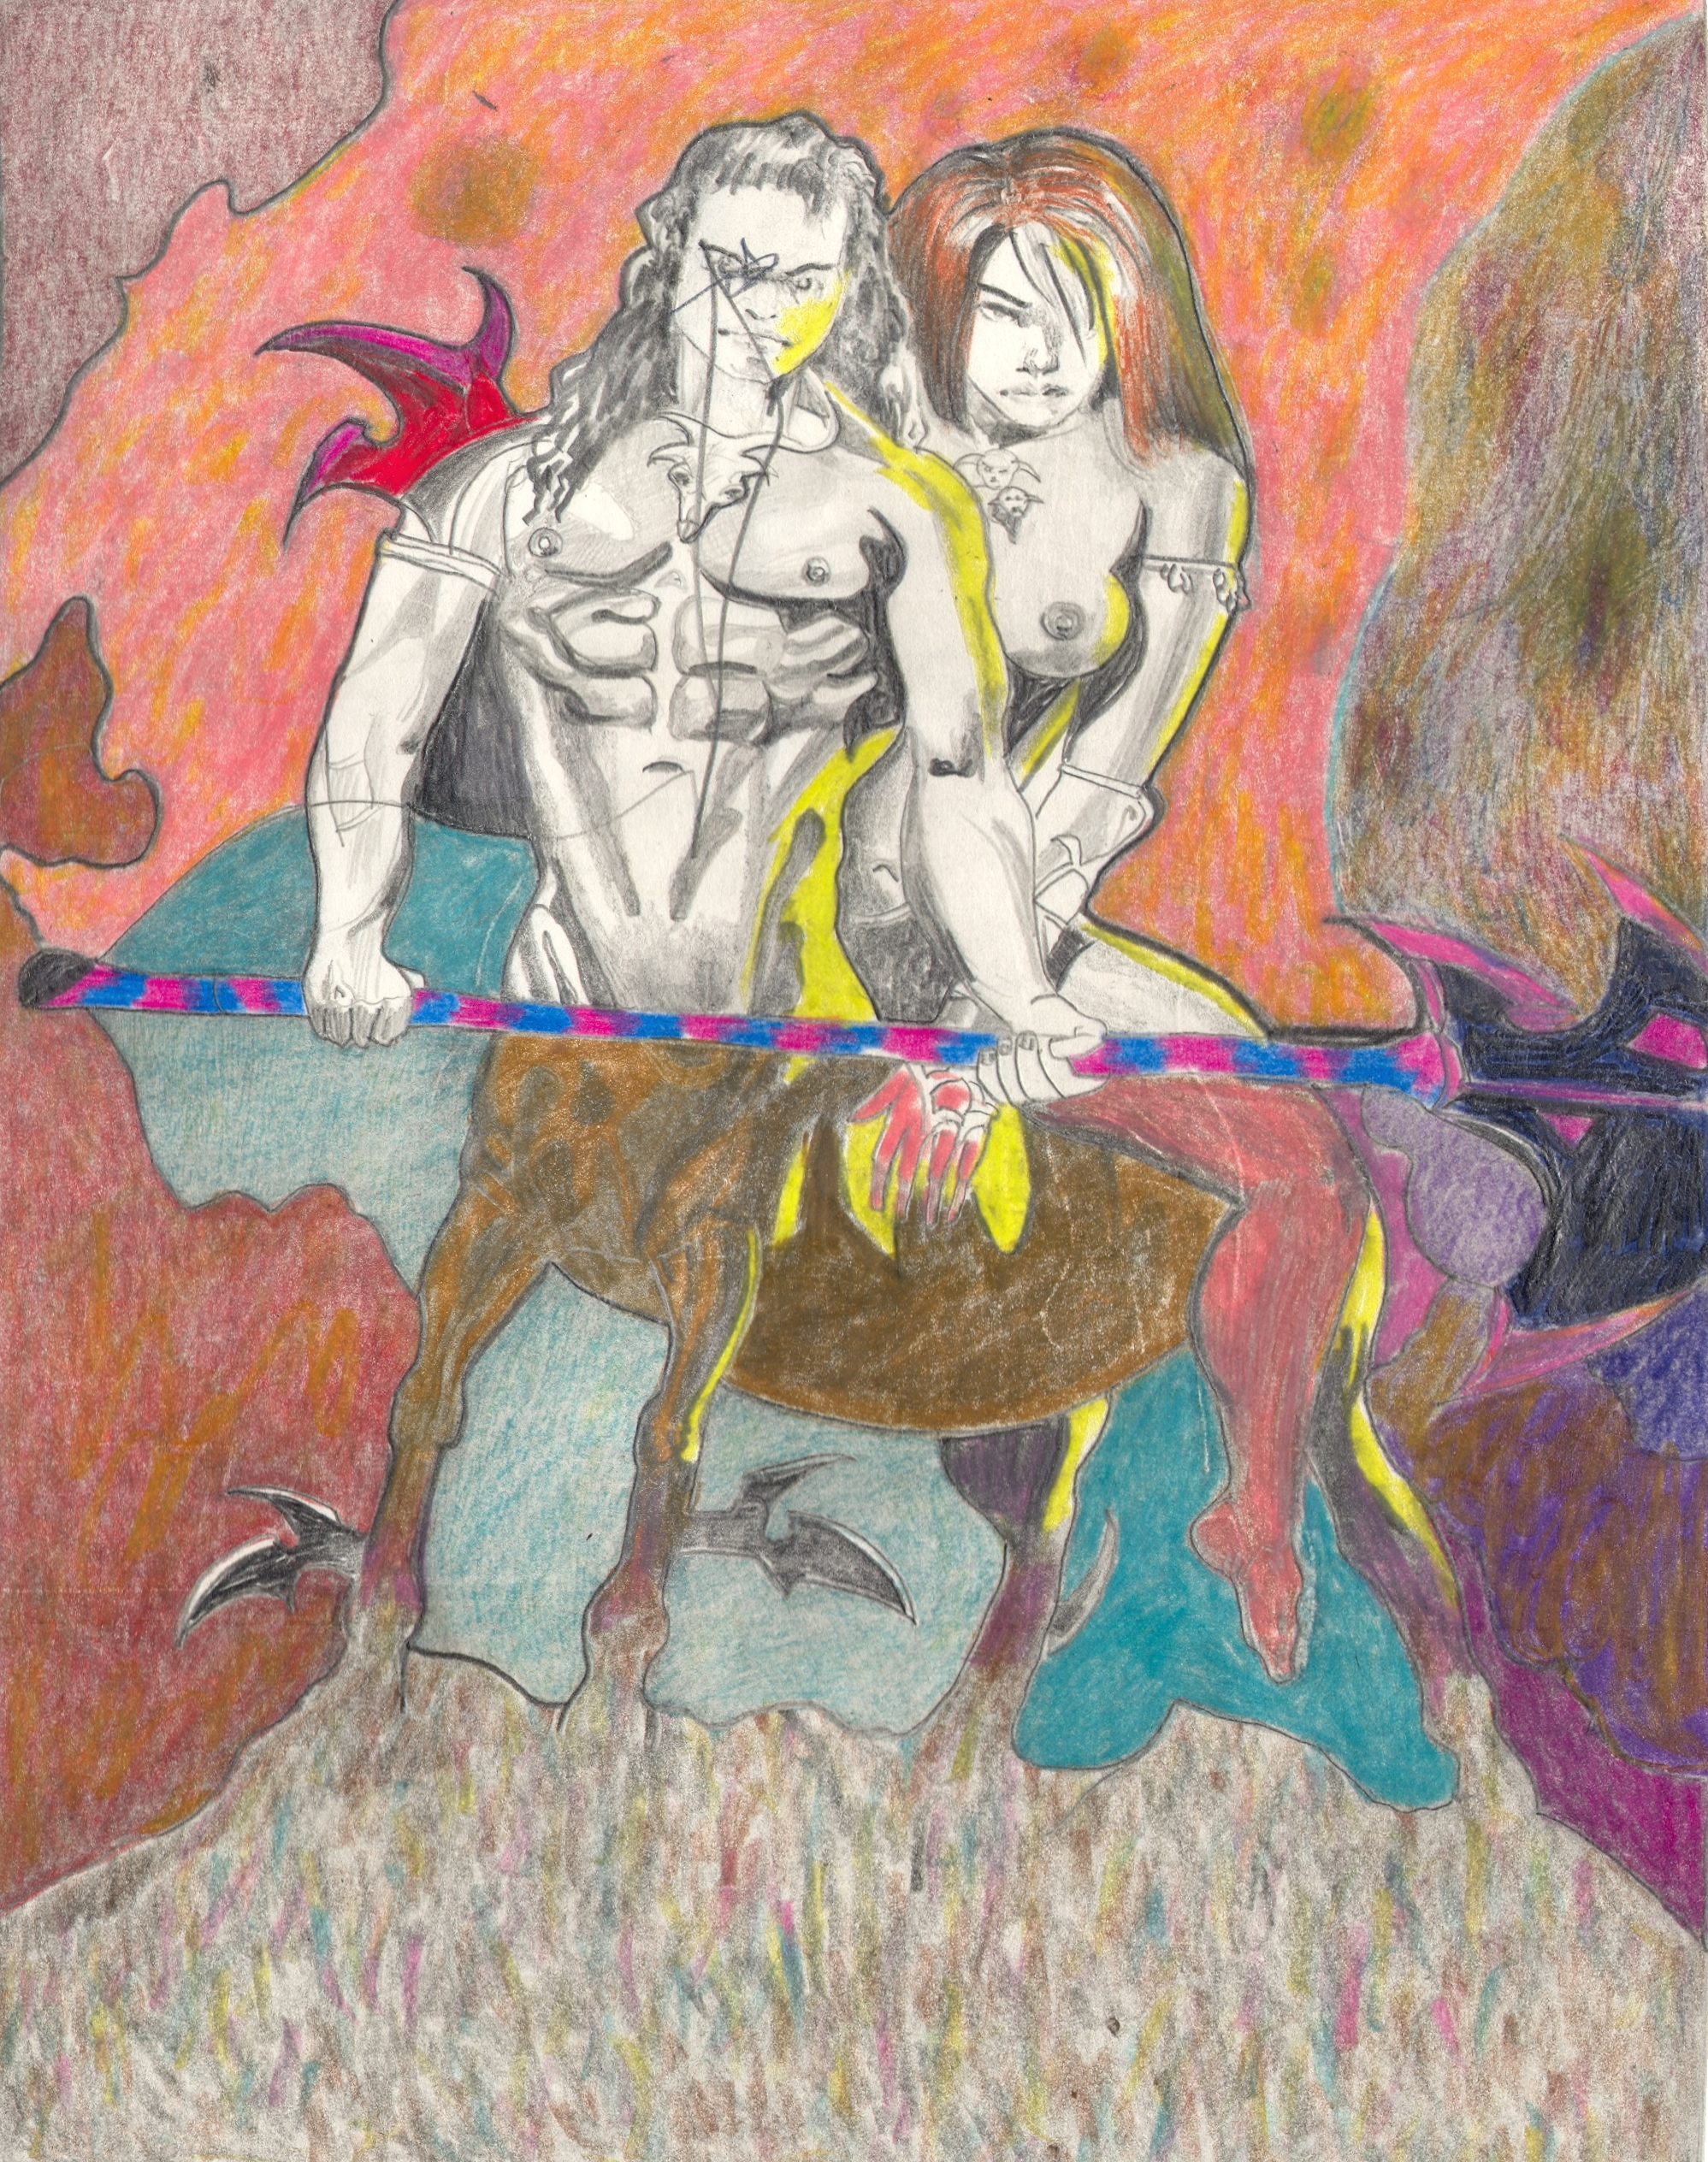 O.T. ( Serie Fantasy II Boris Vallejo Paraphrase ), 2018     Bleistift Buntstift auf Papier, 26x35.5cm